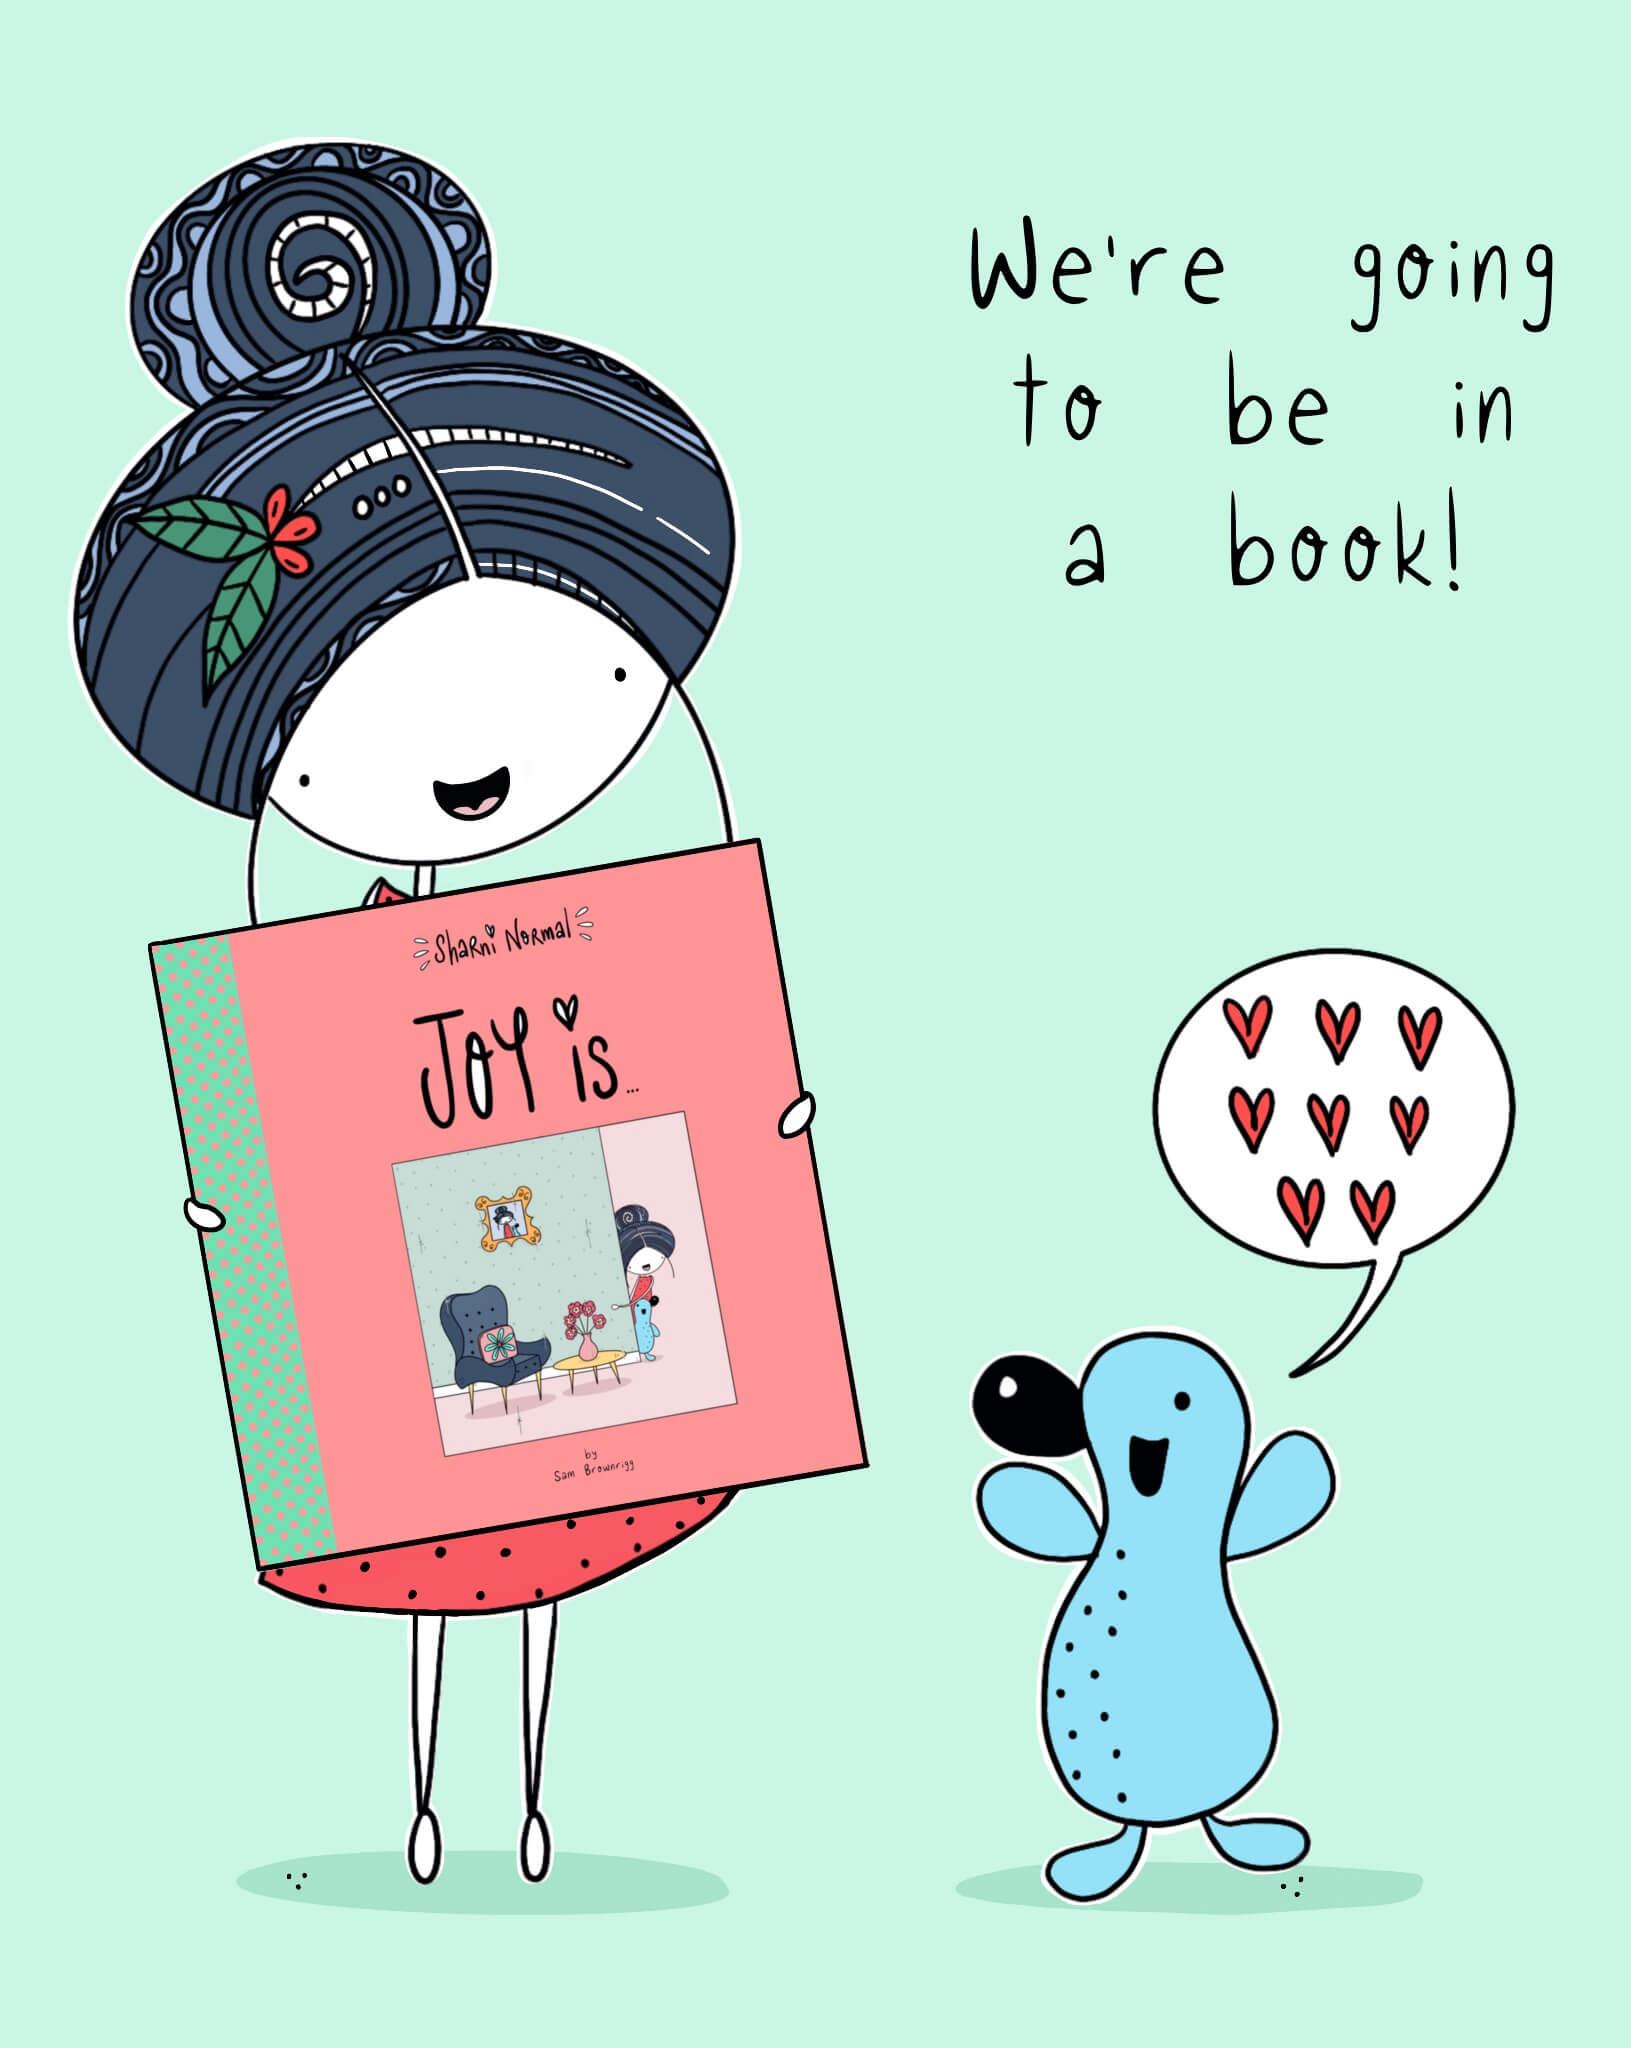 A little book to spread joy!